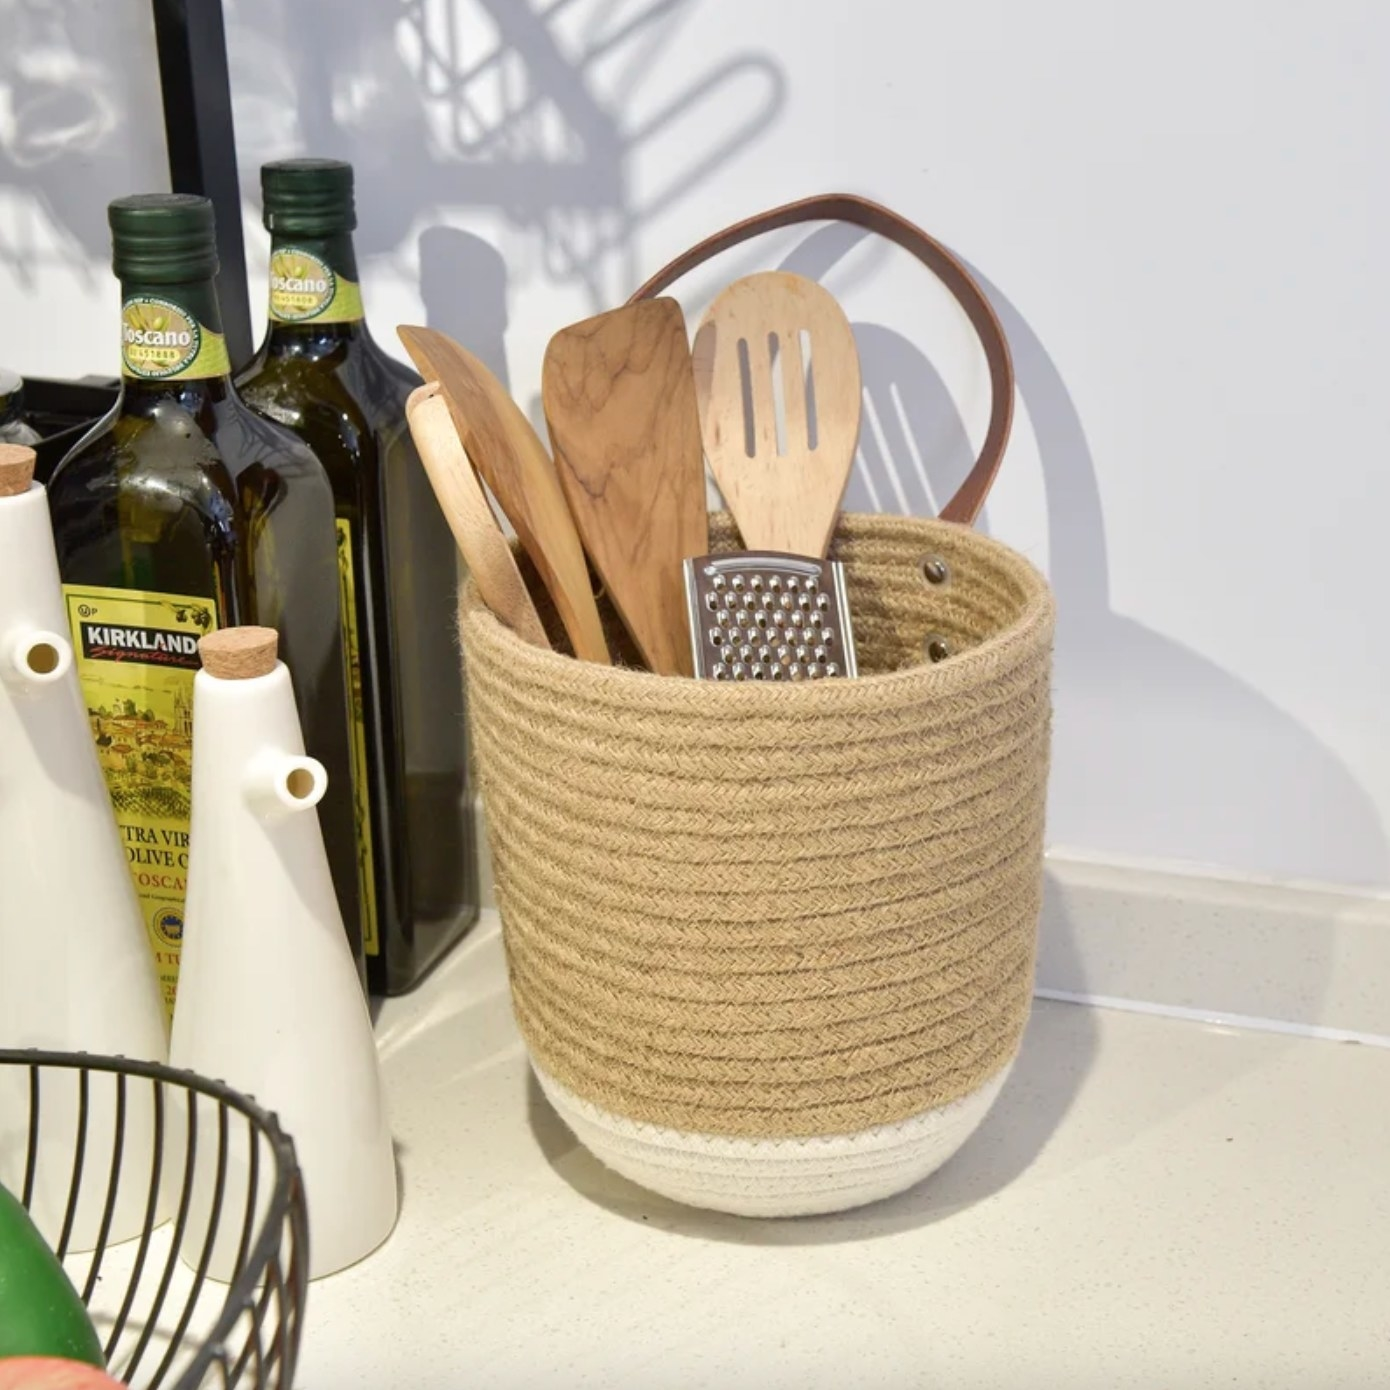 The hanging basket in jute/white